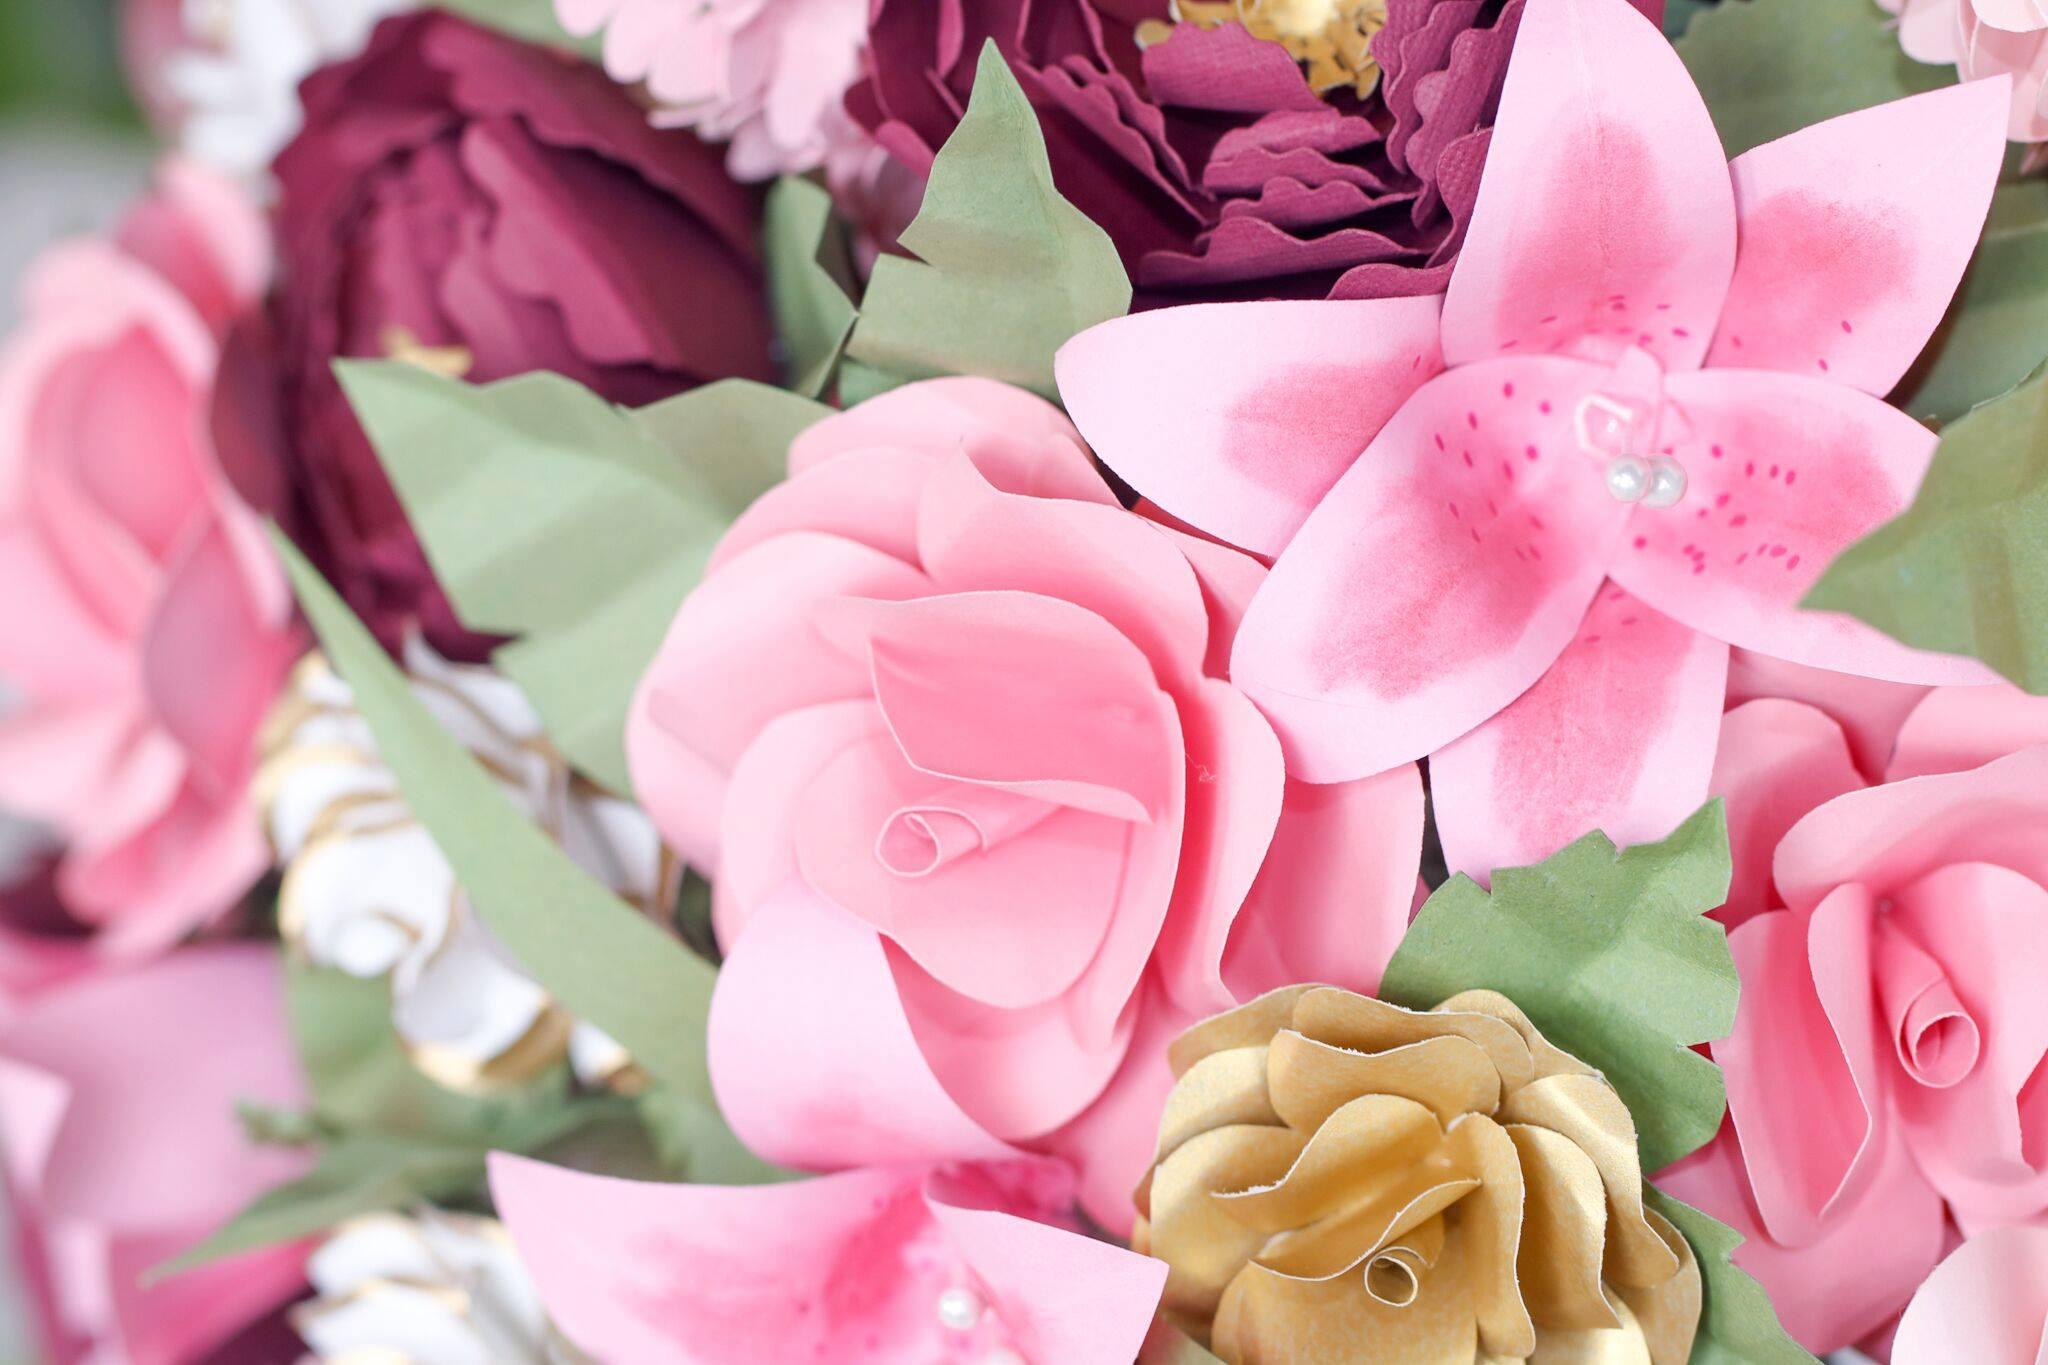 Florist Kalamazoo Paper Blossoms By Michal